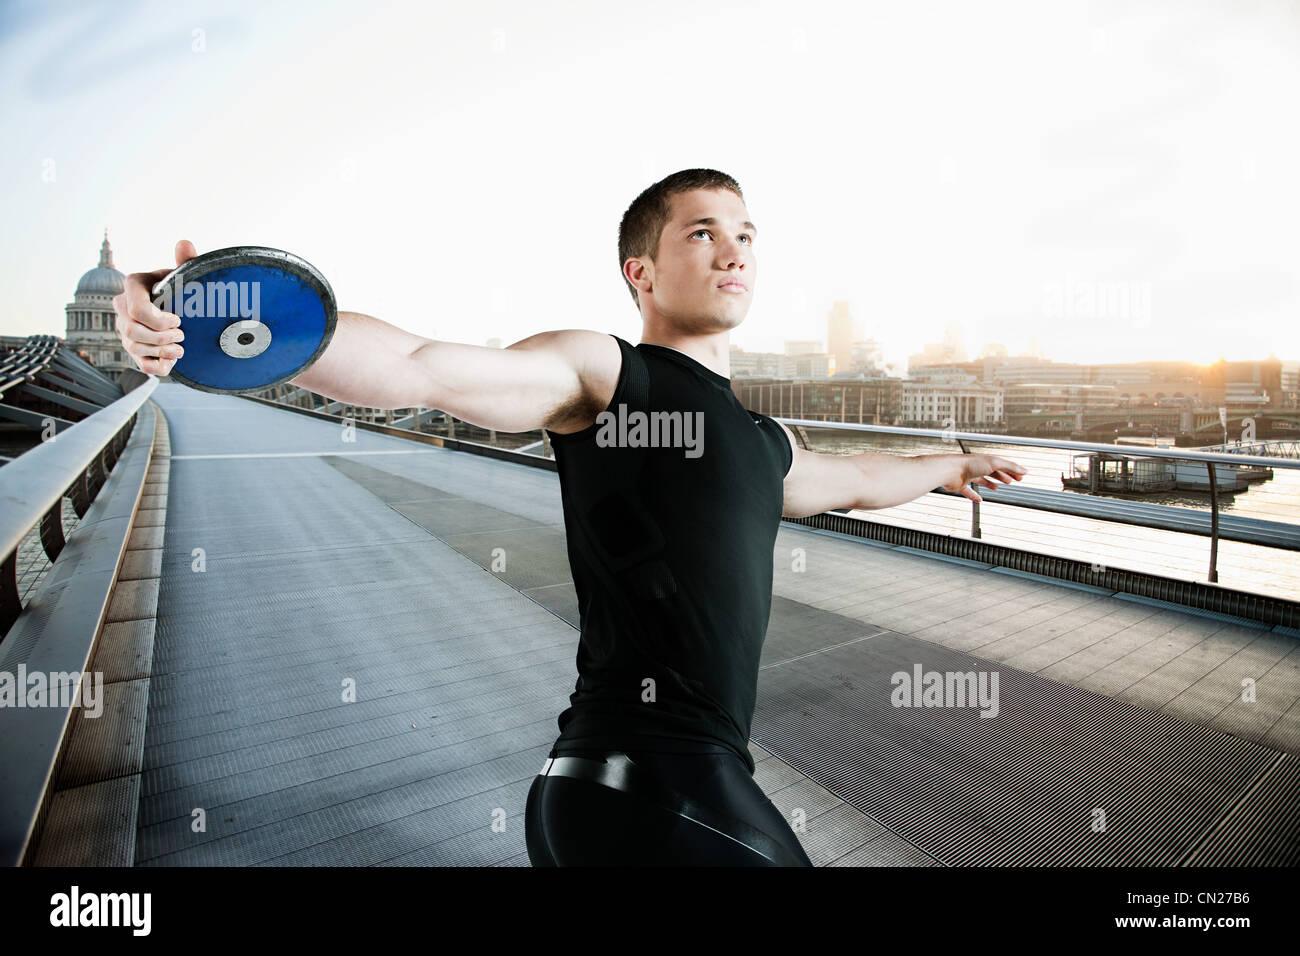 Discus thrower on Millennium Bridge, London, England - Stock Image